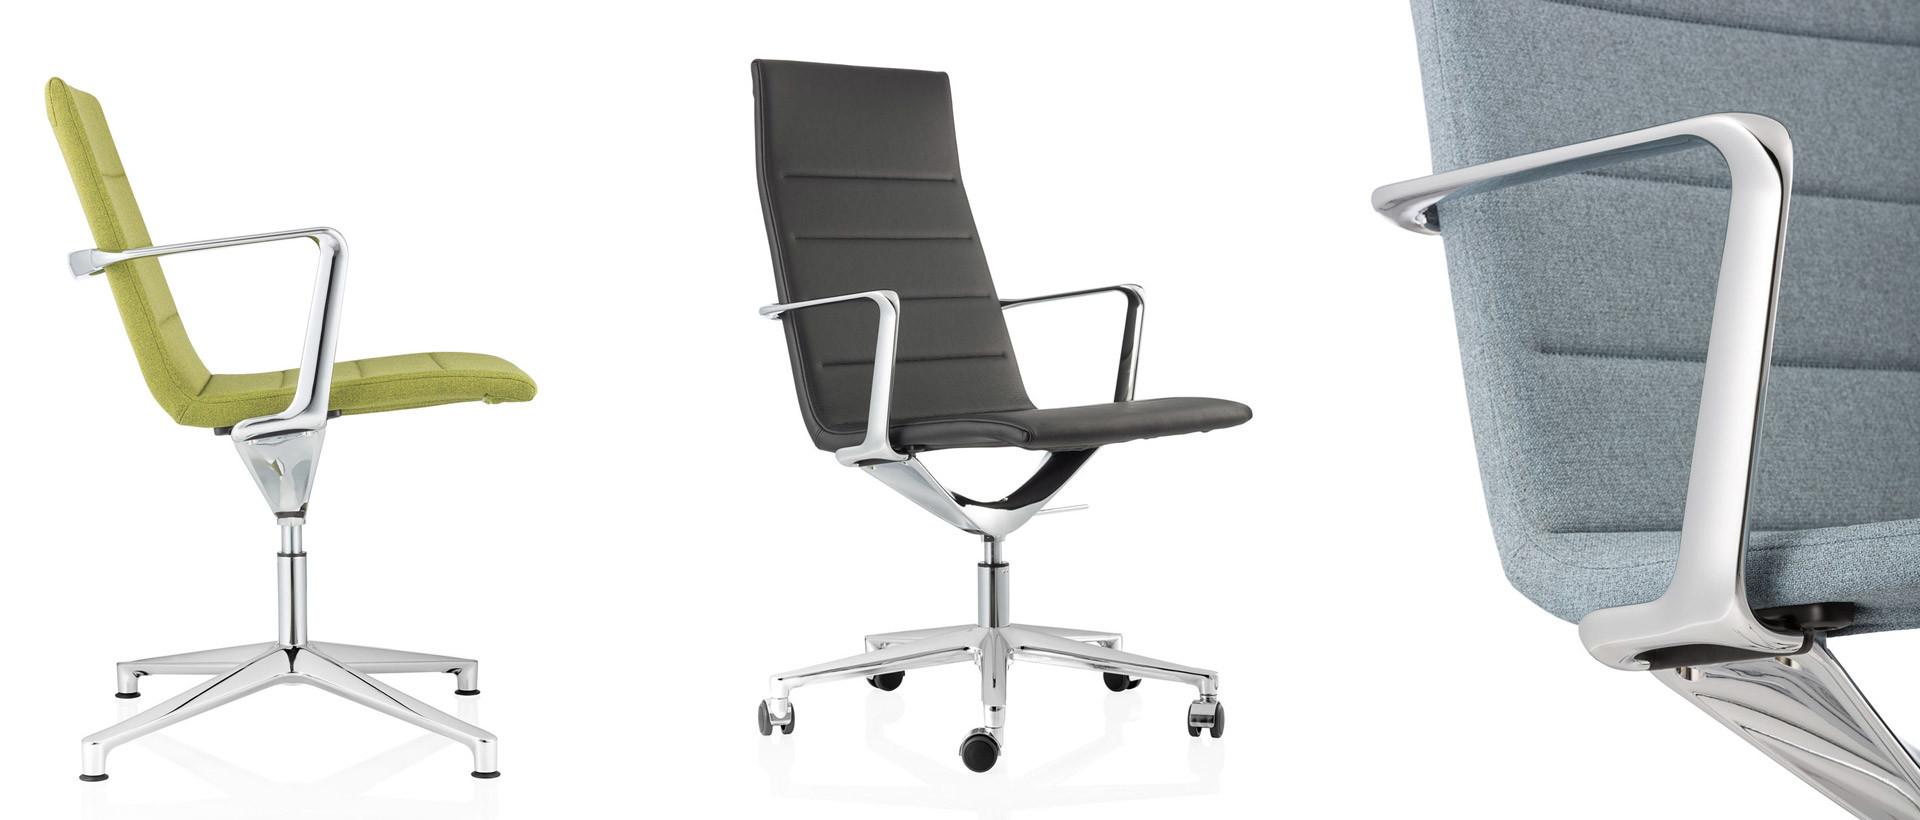 sedie ufficio acciaio tessuto e pelle